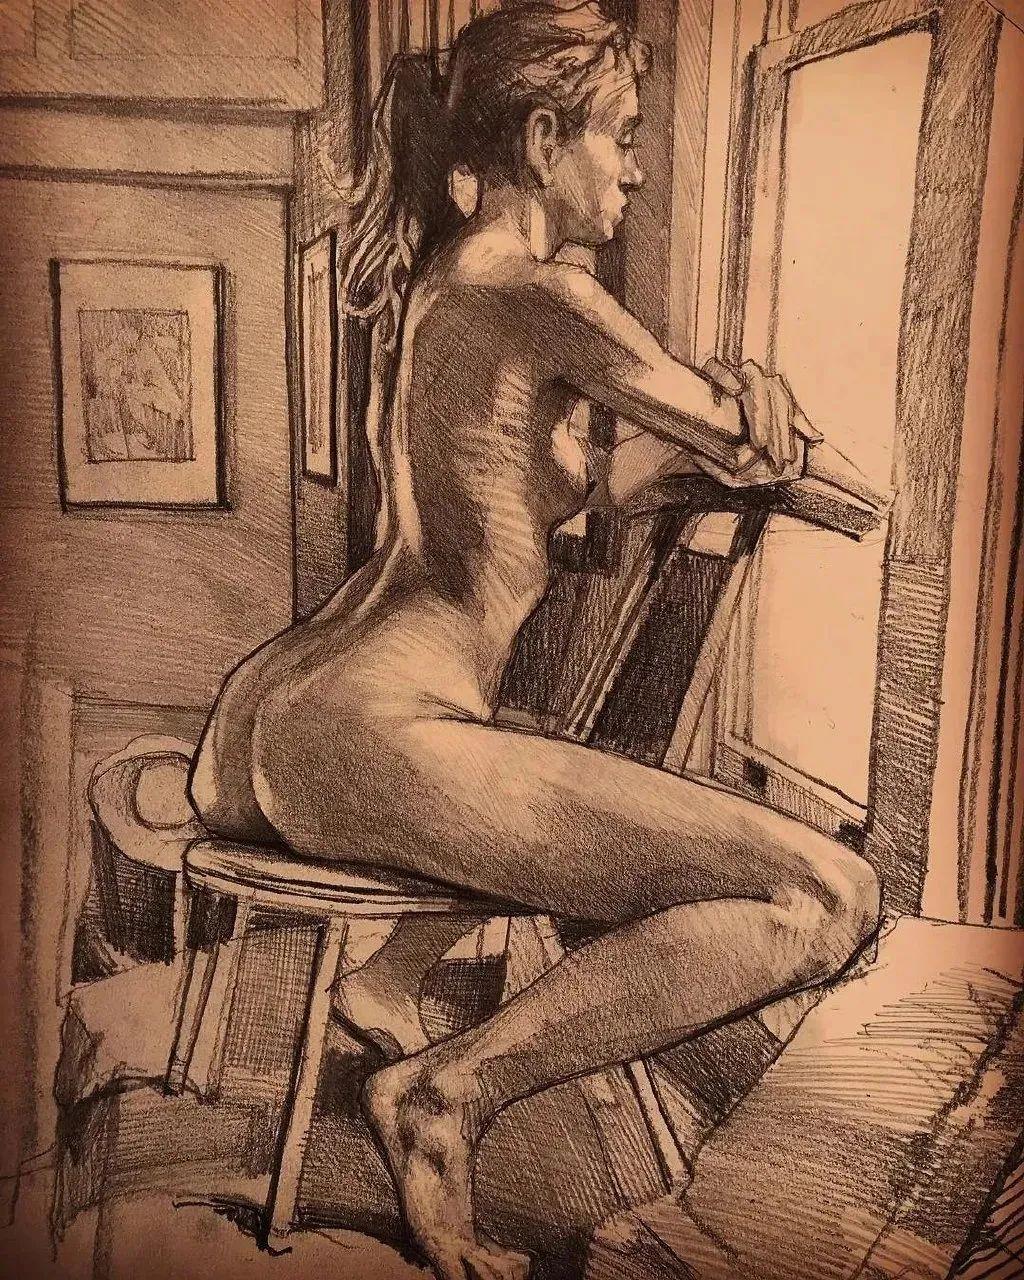 Dr. Garry Pound史蒂夫·斯科特 素描作品欣赏:实力很强!插图21